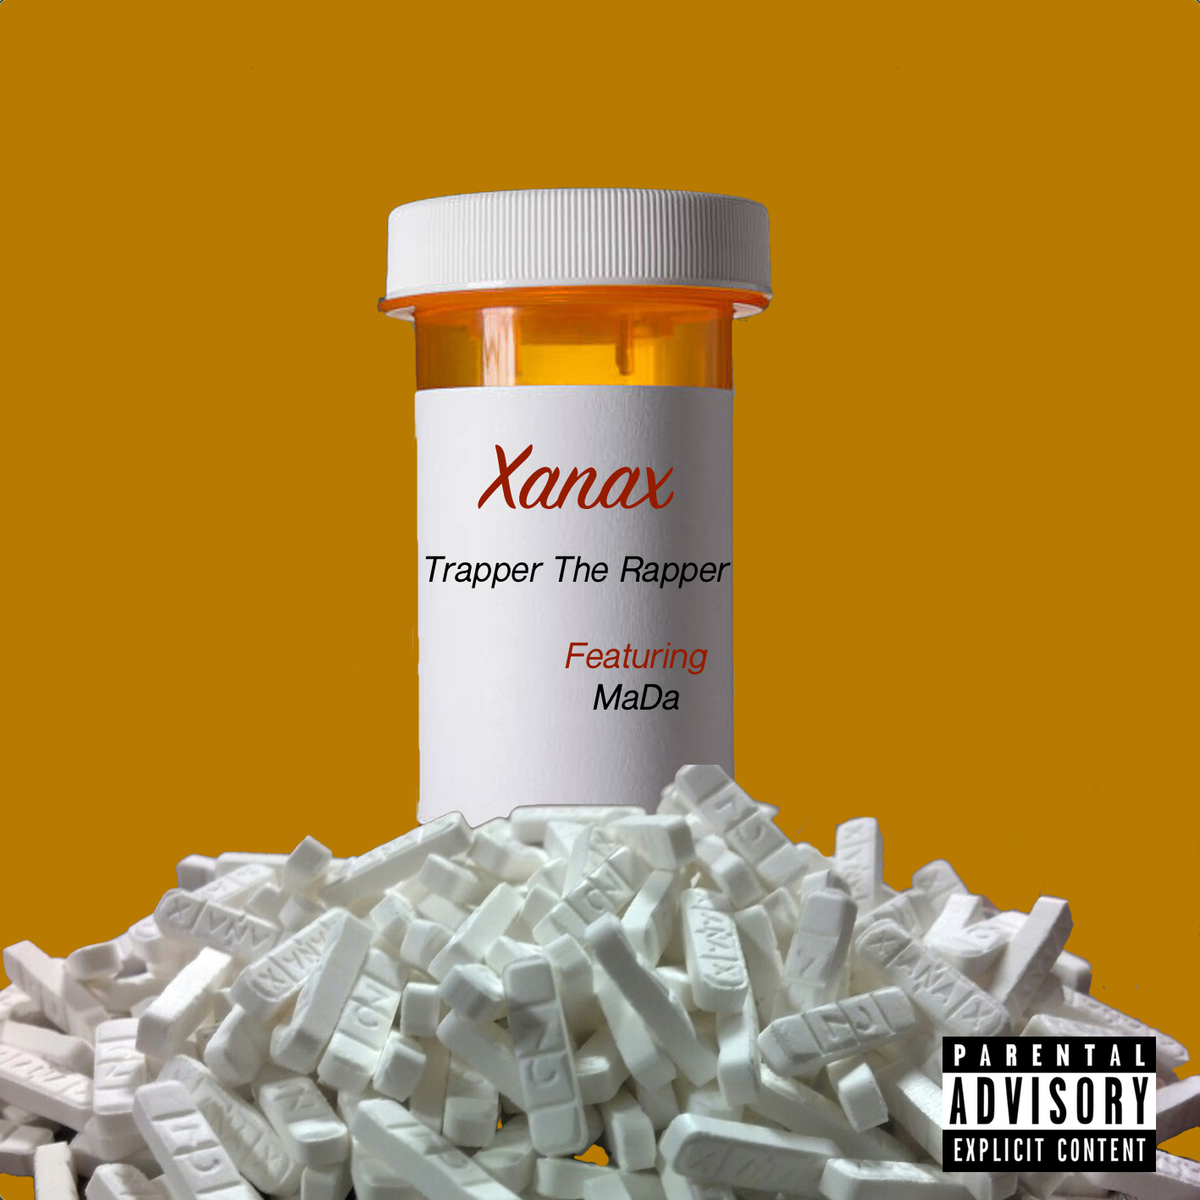 Trapper the Rapper - Xanax (SERVICE PACK)